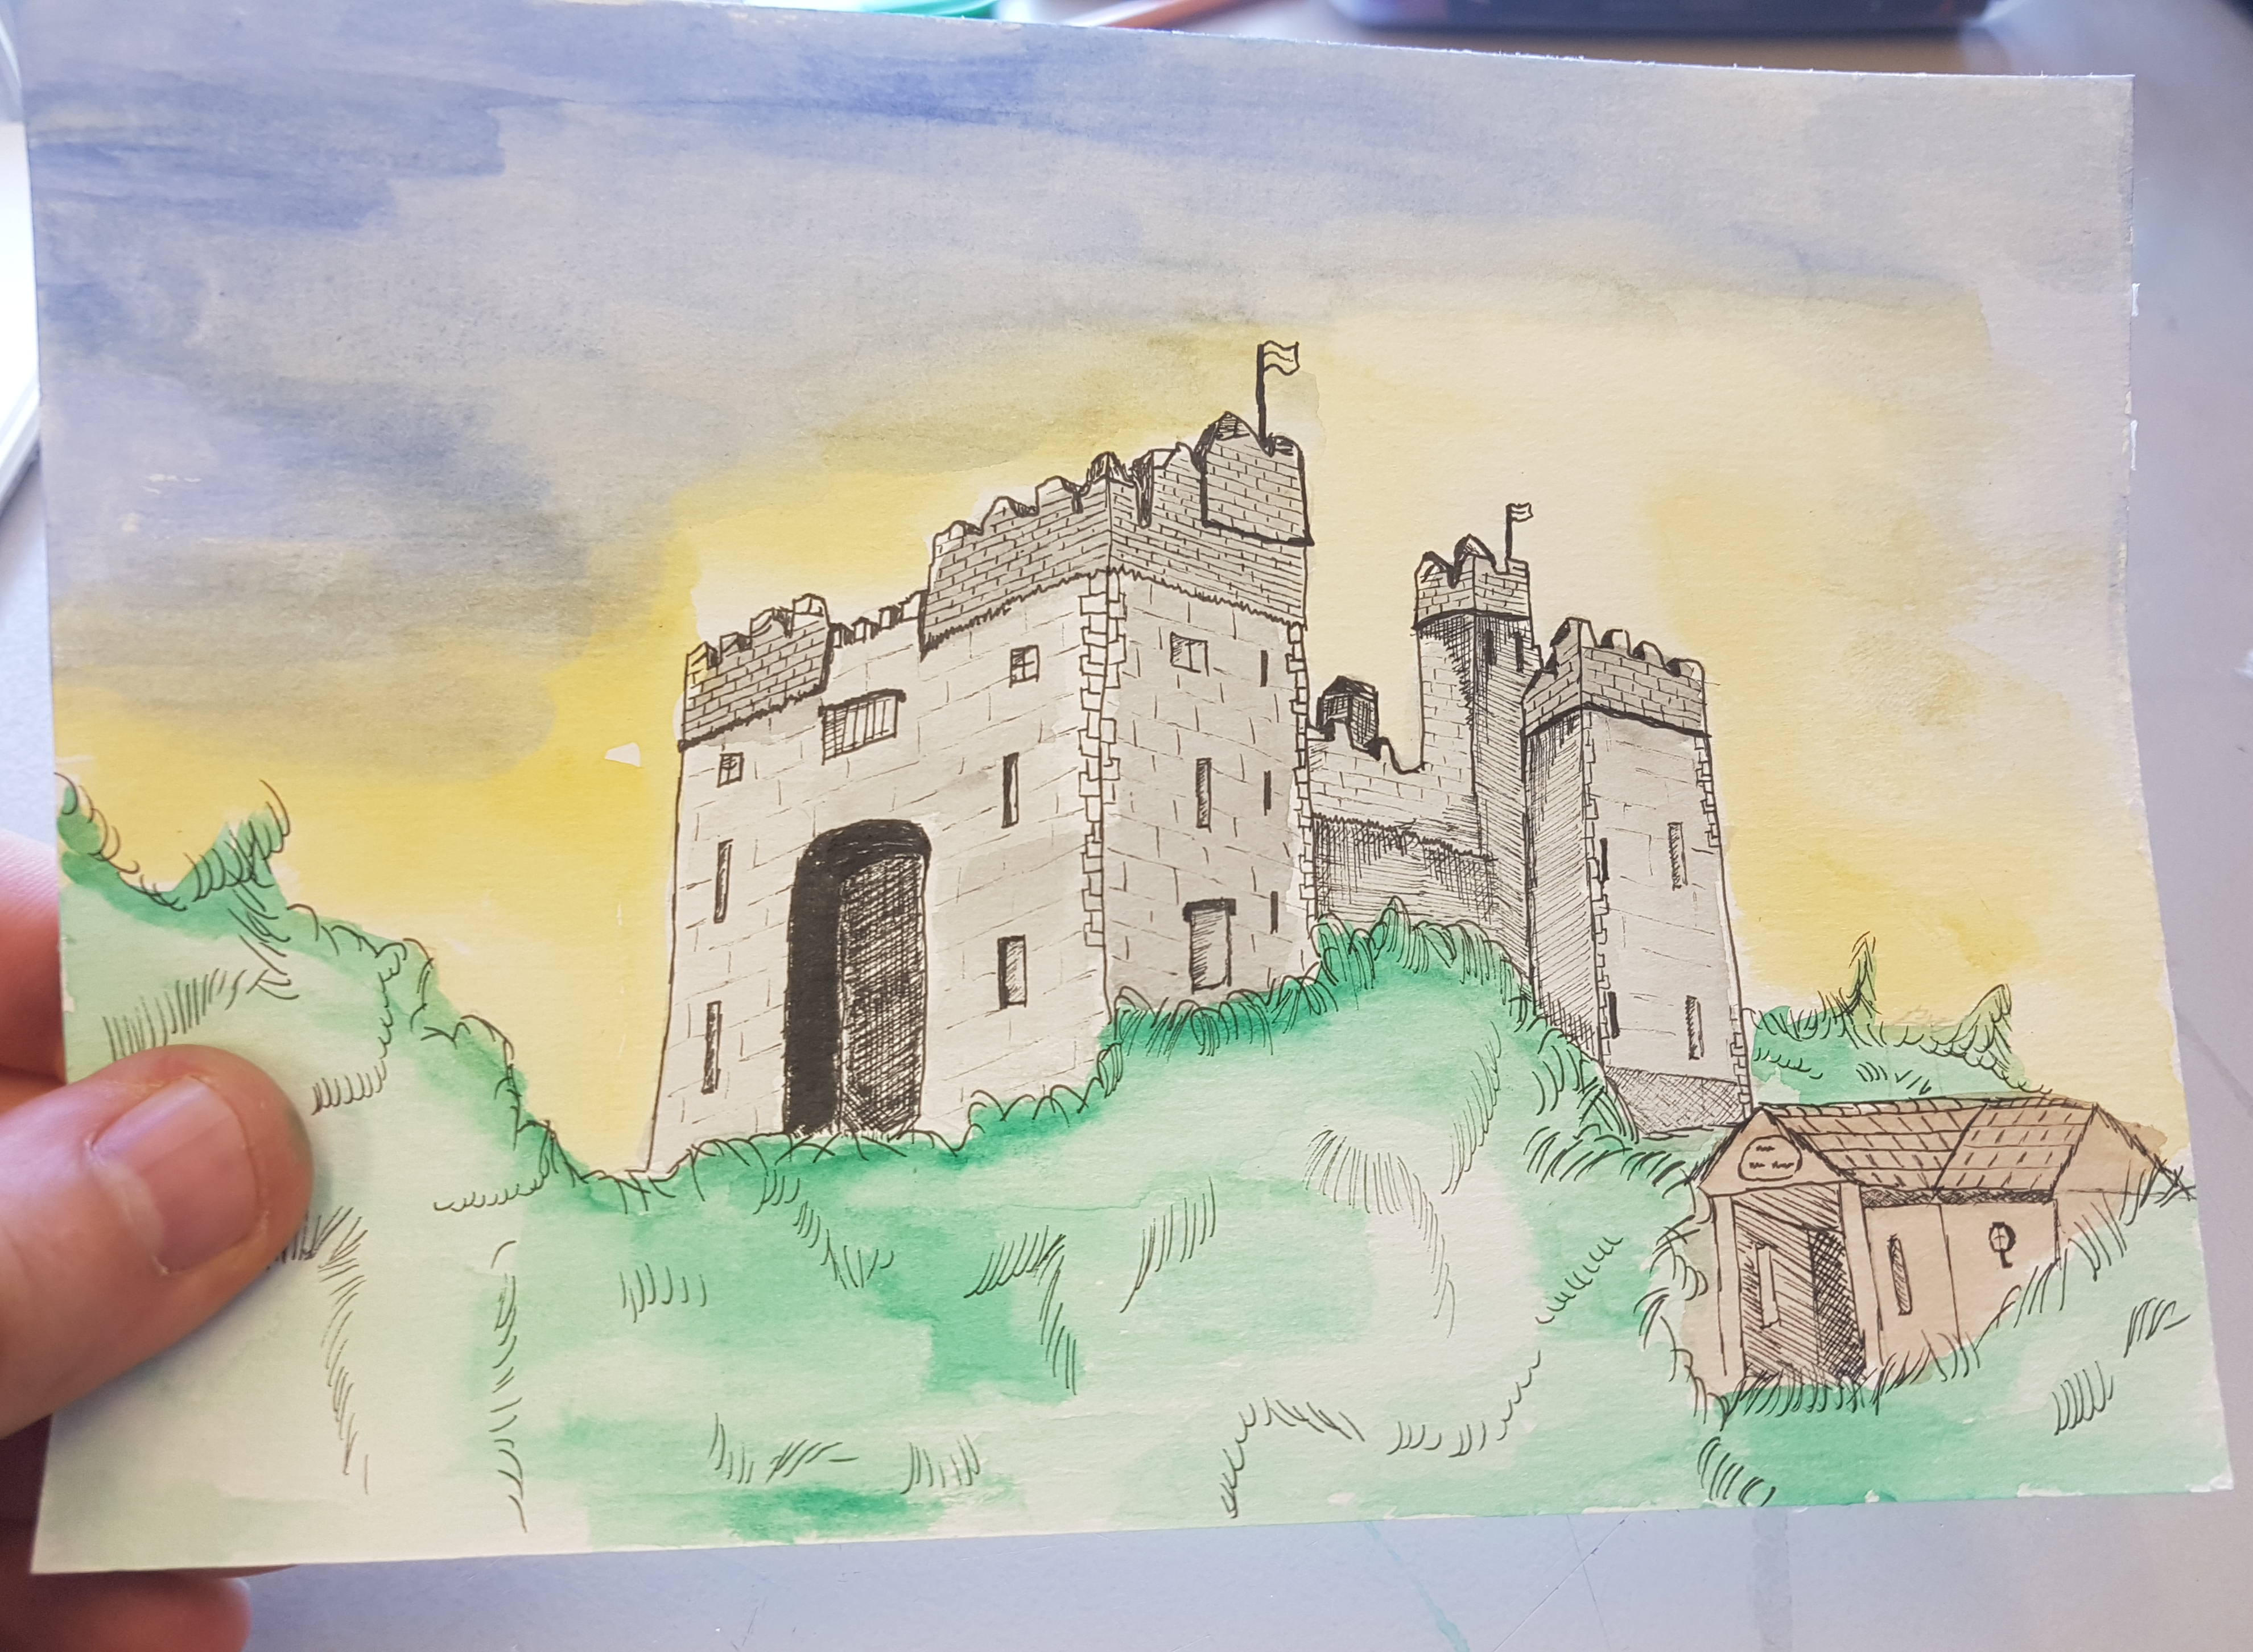 kasteel tekening